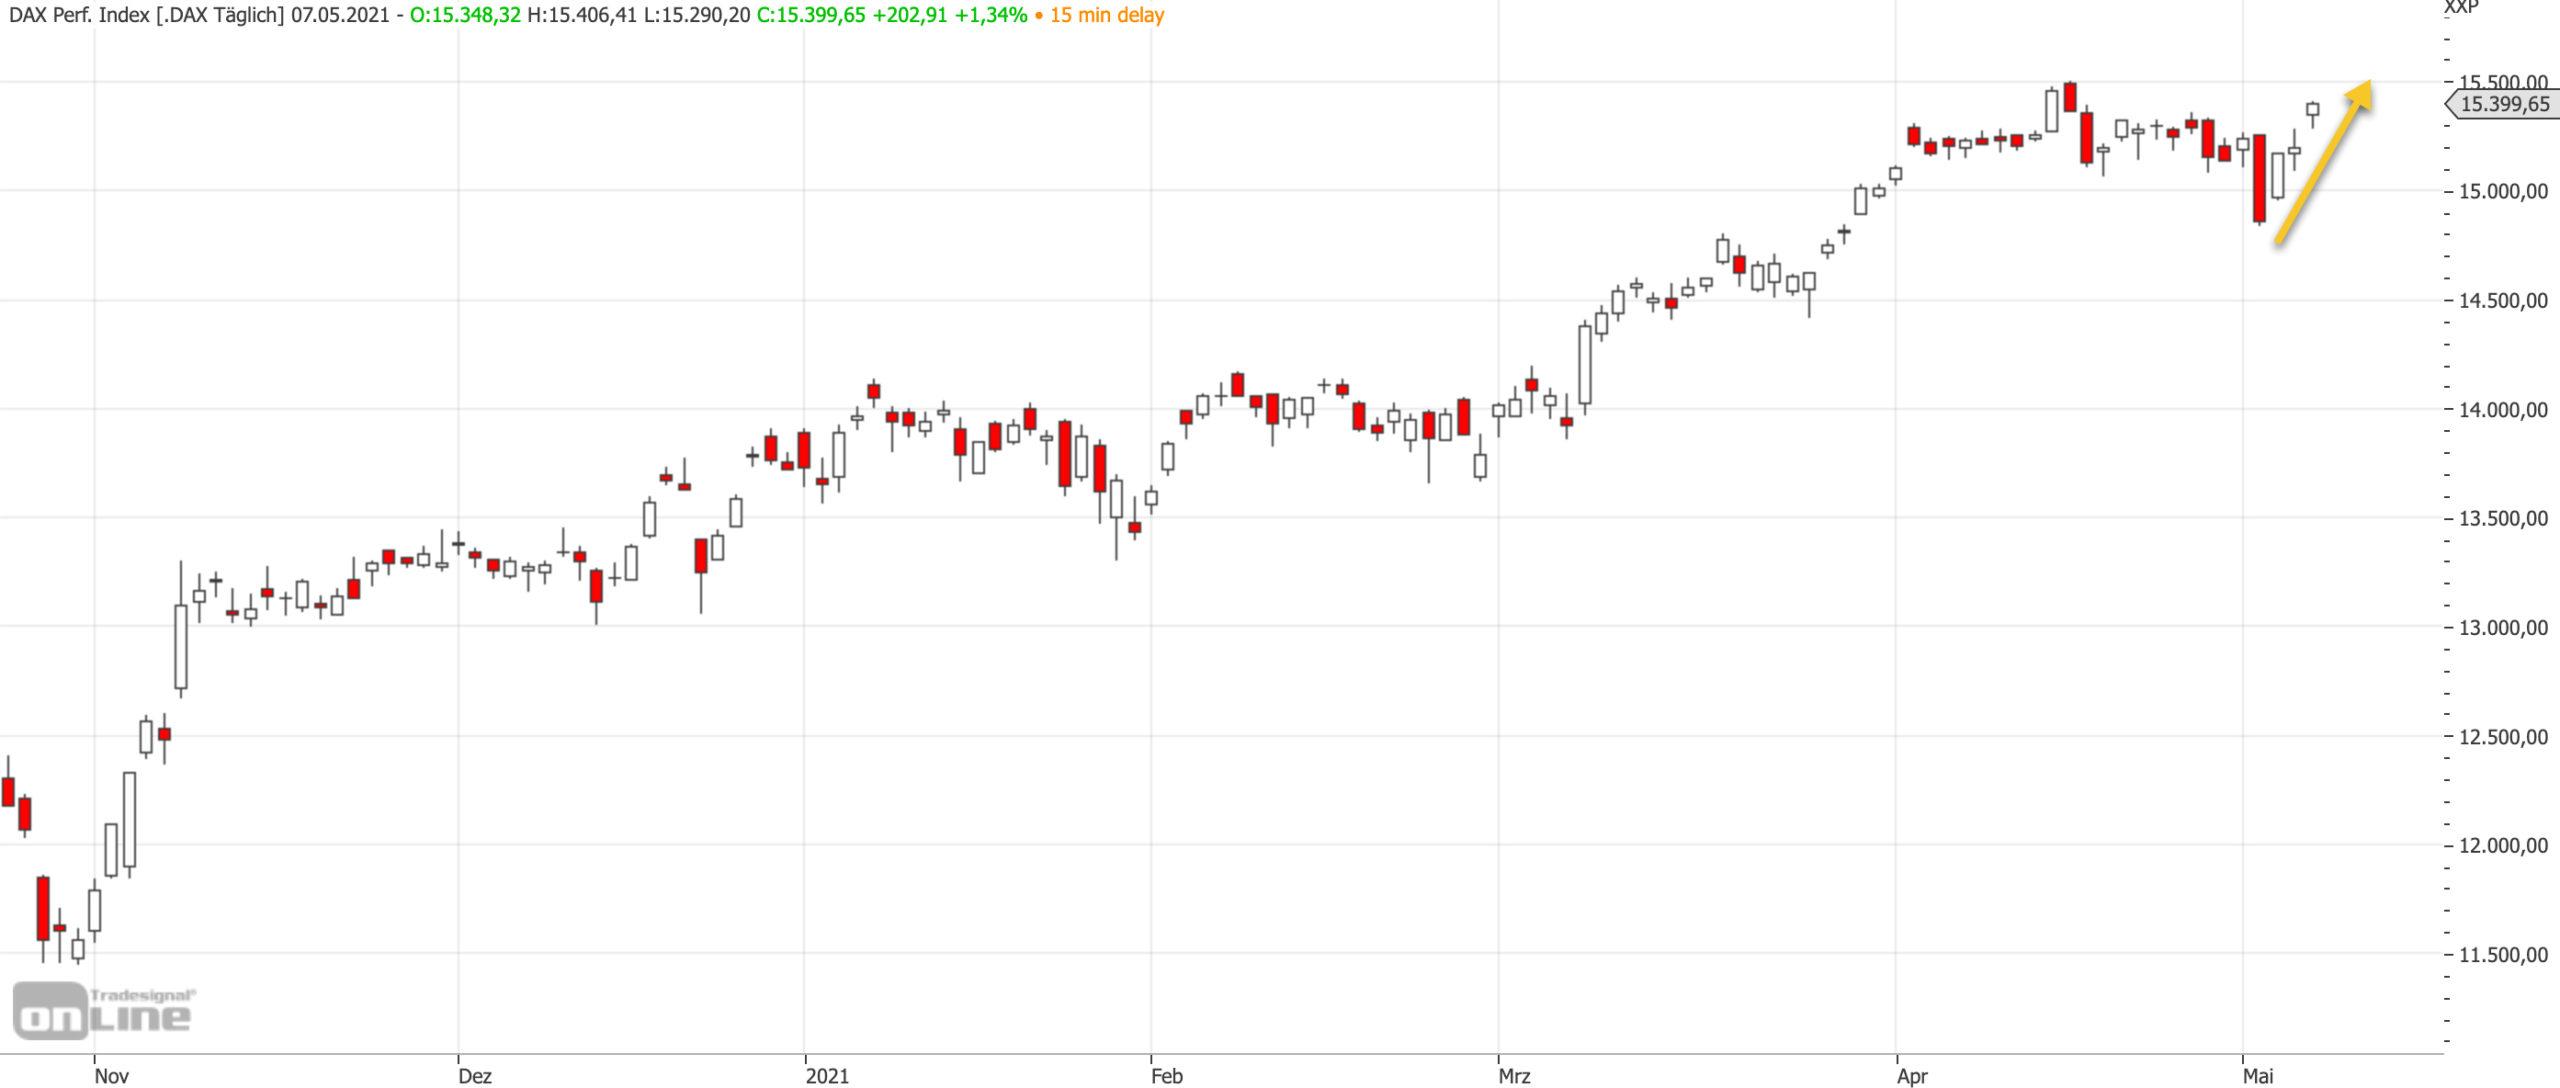 Mittelfristiger DAX-Chart am 07.05.2021